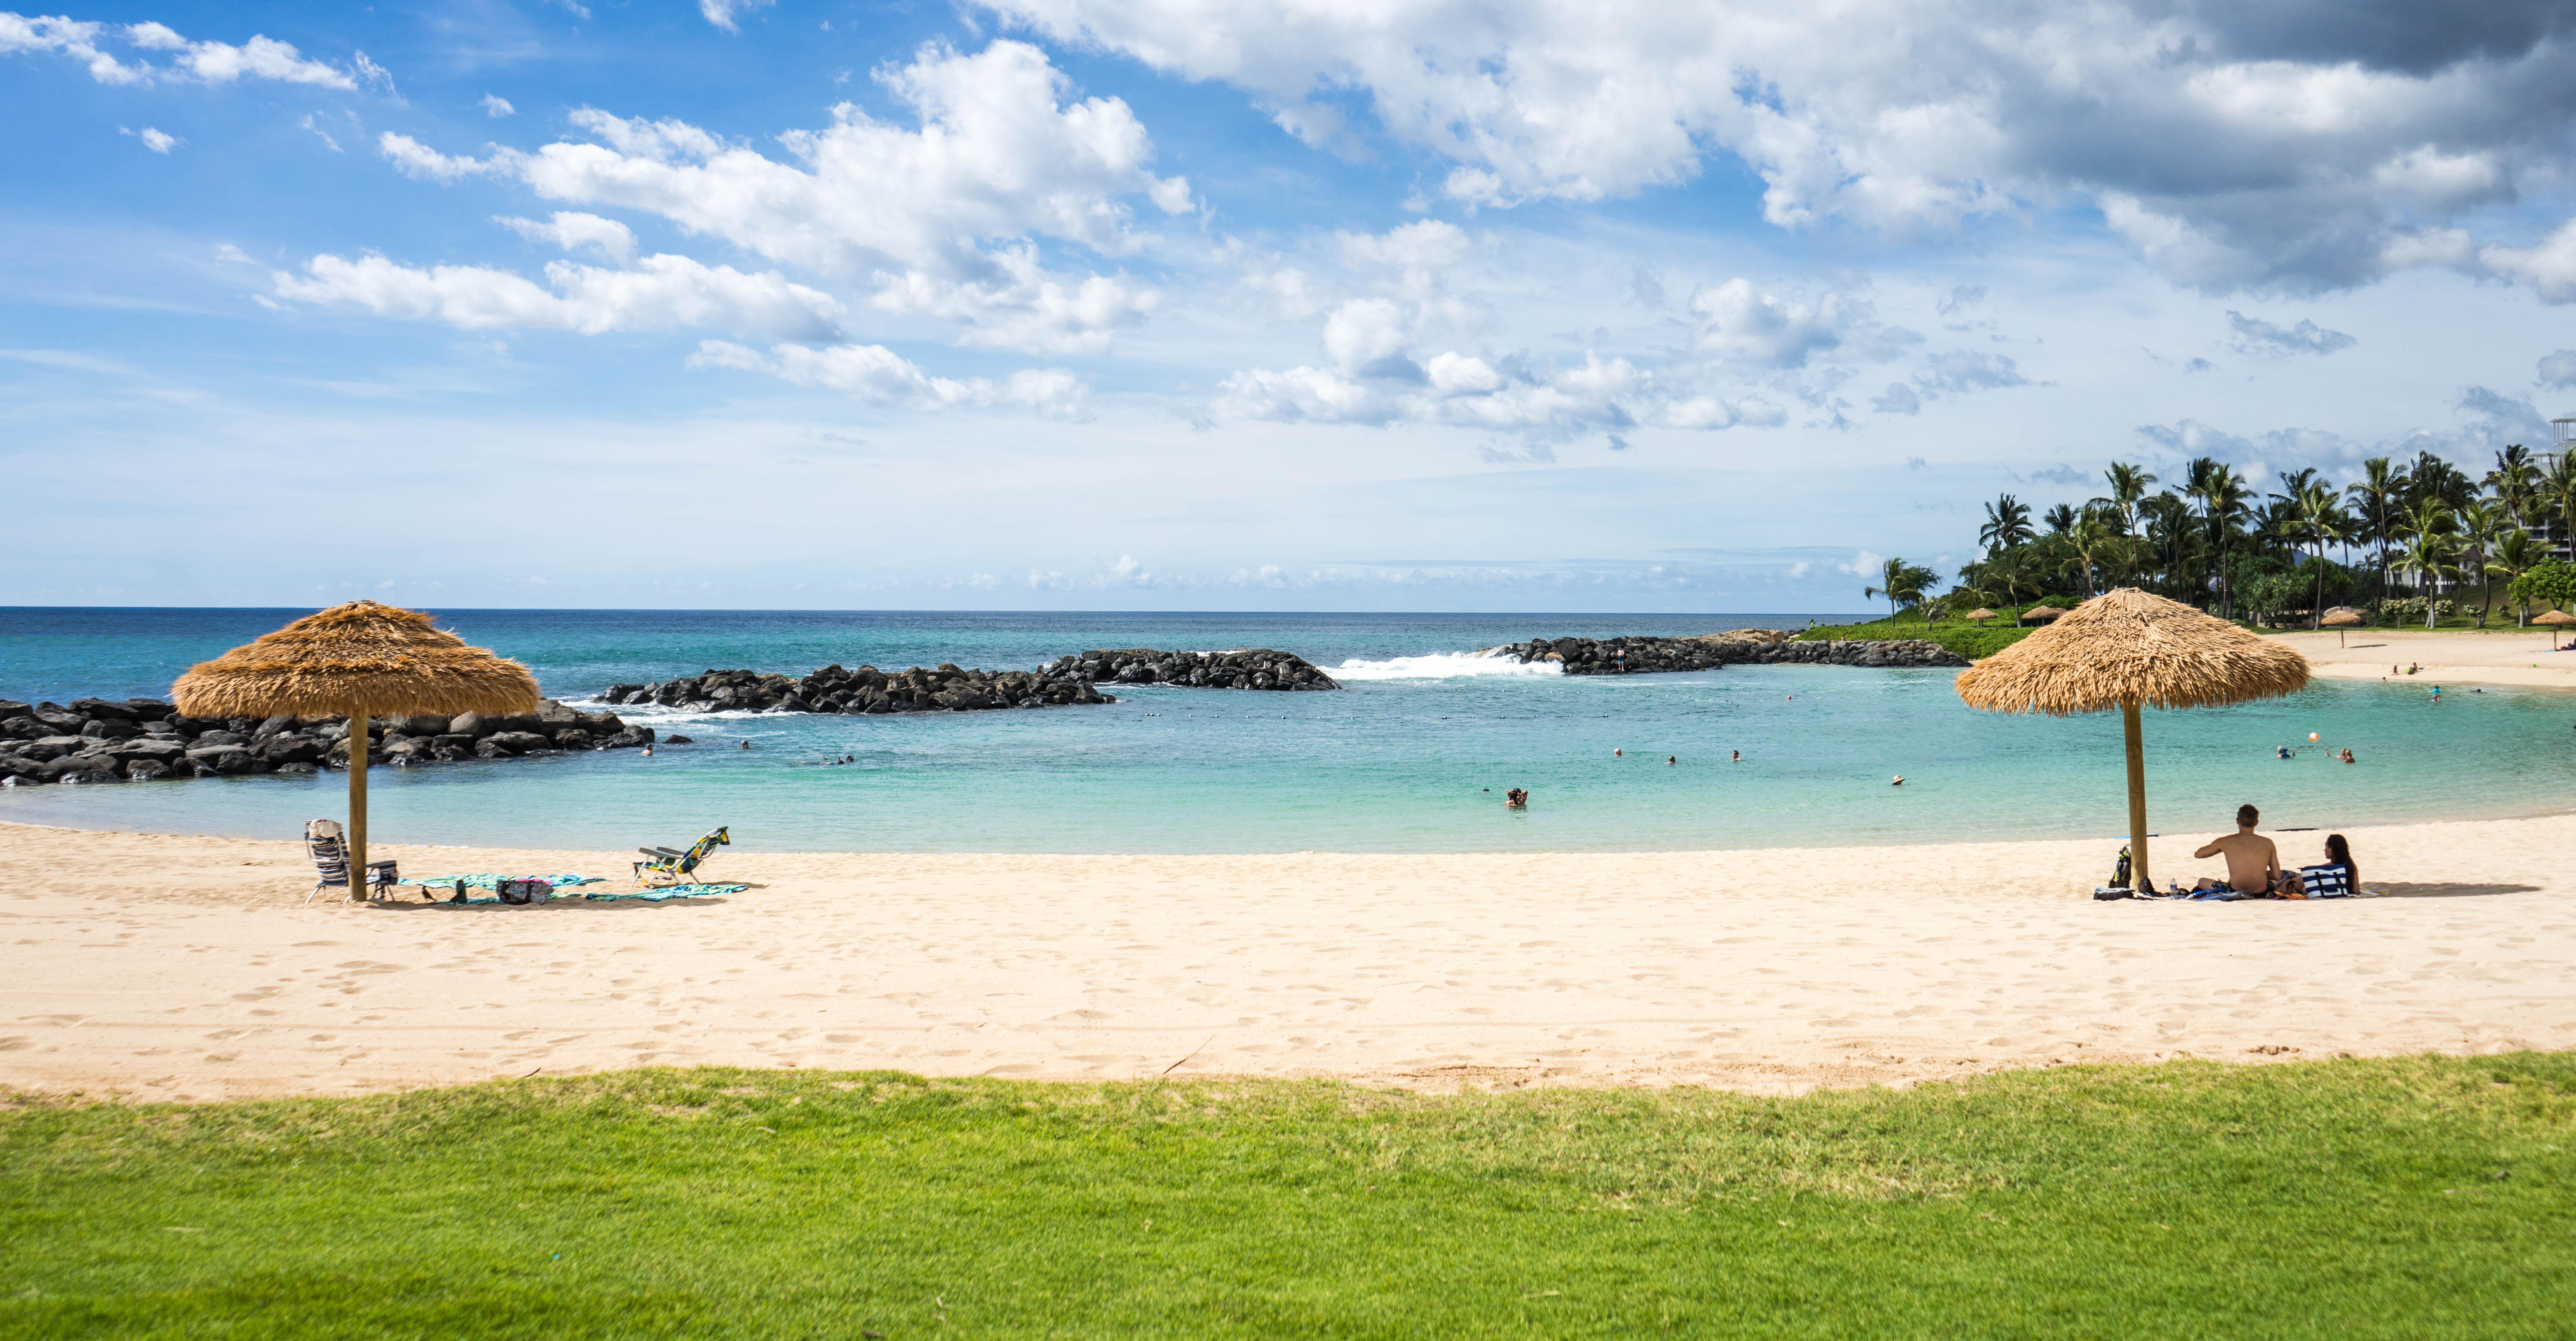 Water Natuur Zand Oceaan Hemel Kust Zomer Vakantie Reizen Inham Zeegezicht Lagune Baai Eiland Hawaii Waterlichaam Blauwe Lucht Zonnig